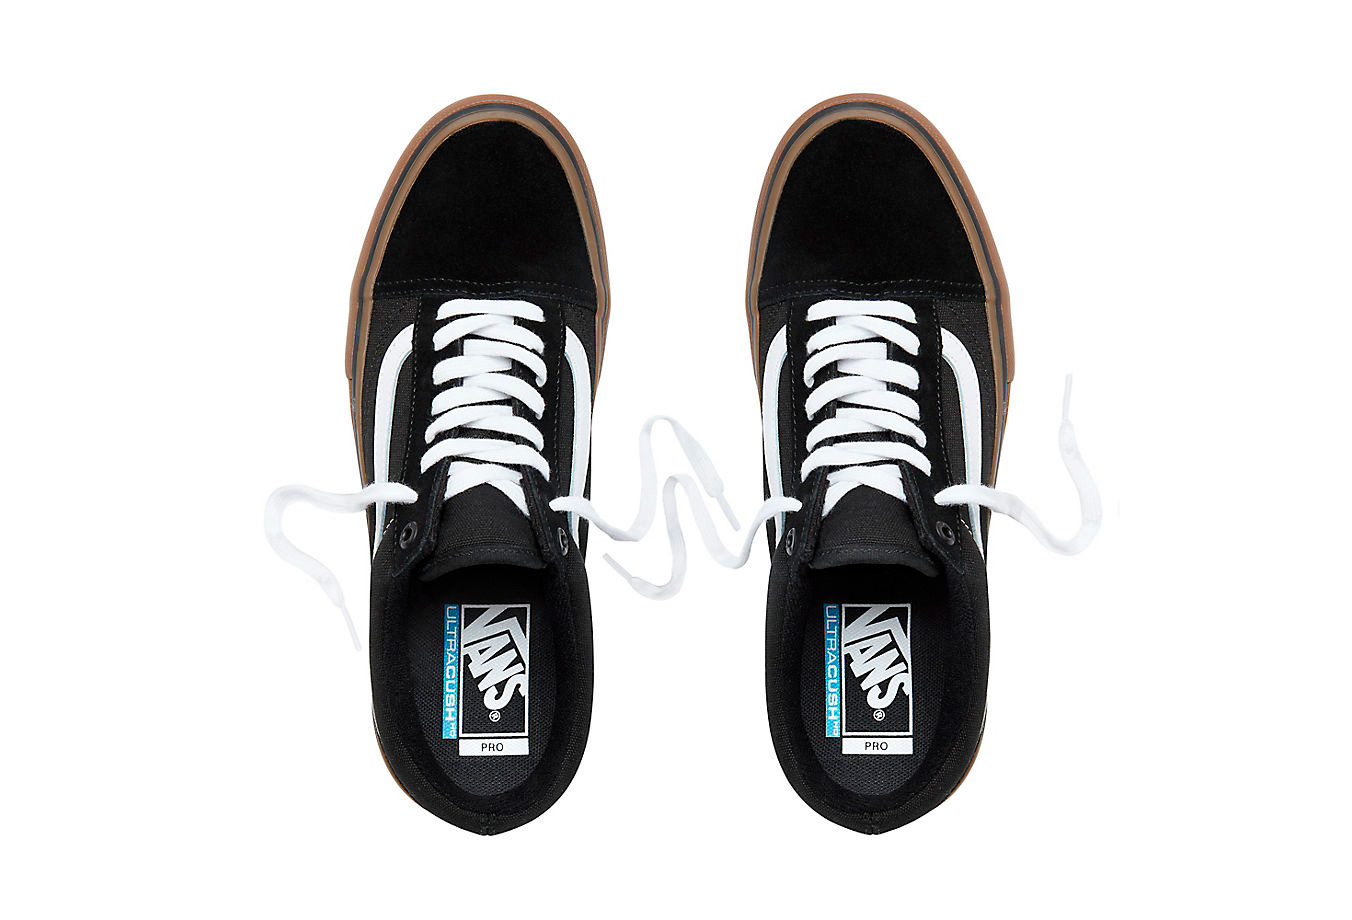 Vans Old Skool Pro Shoes Black White Gum